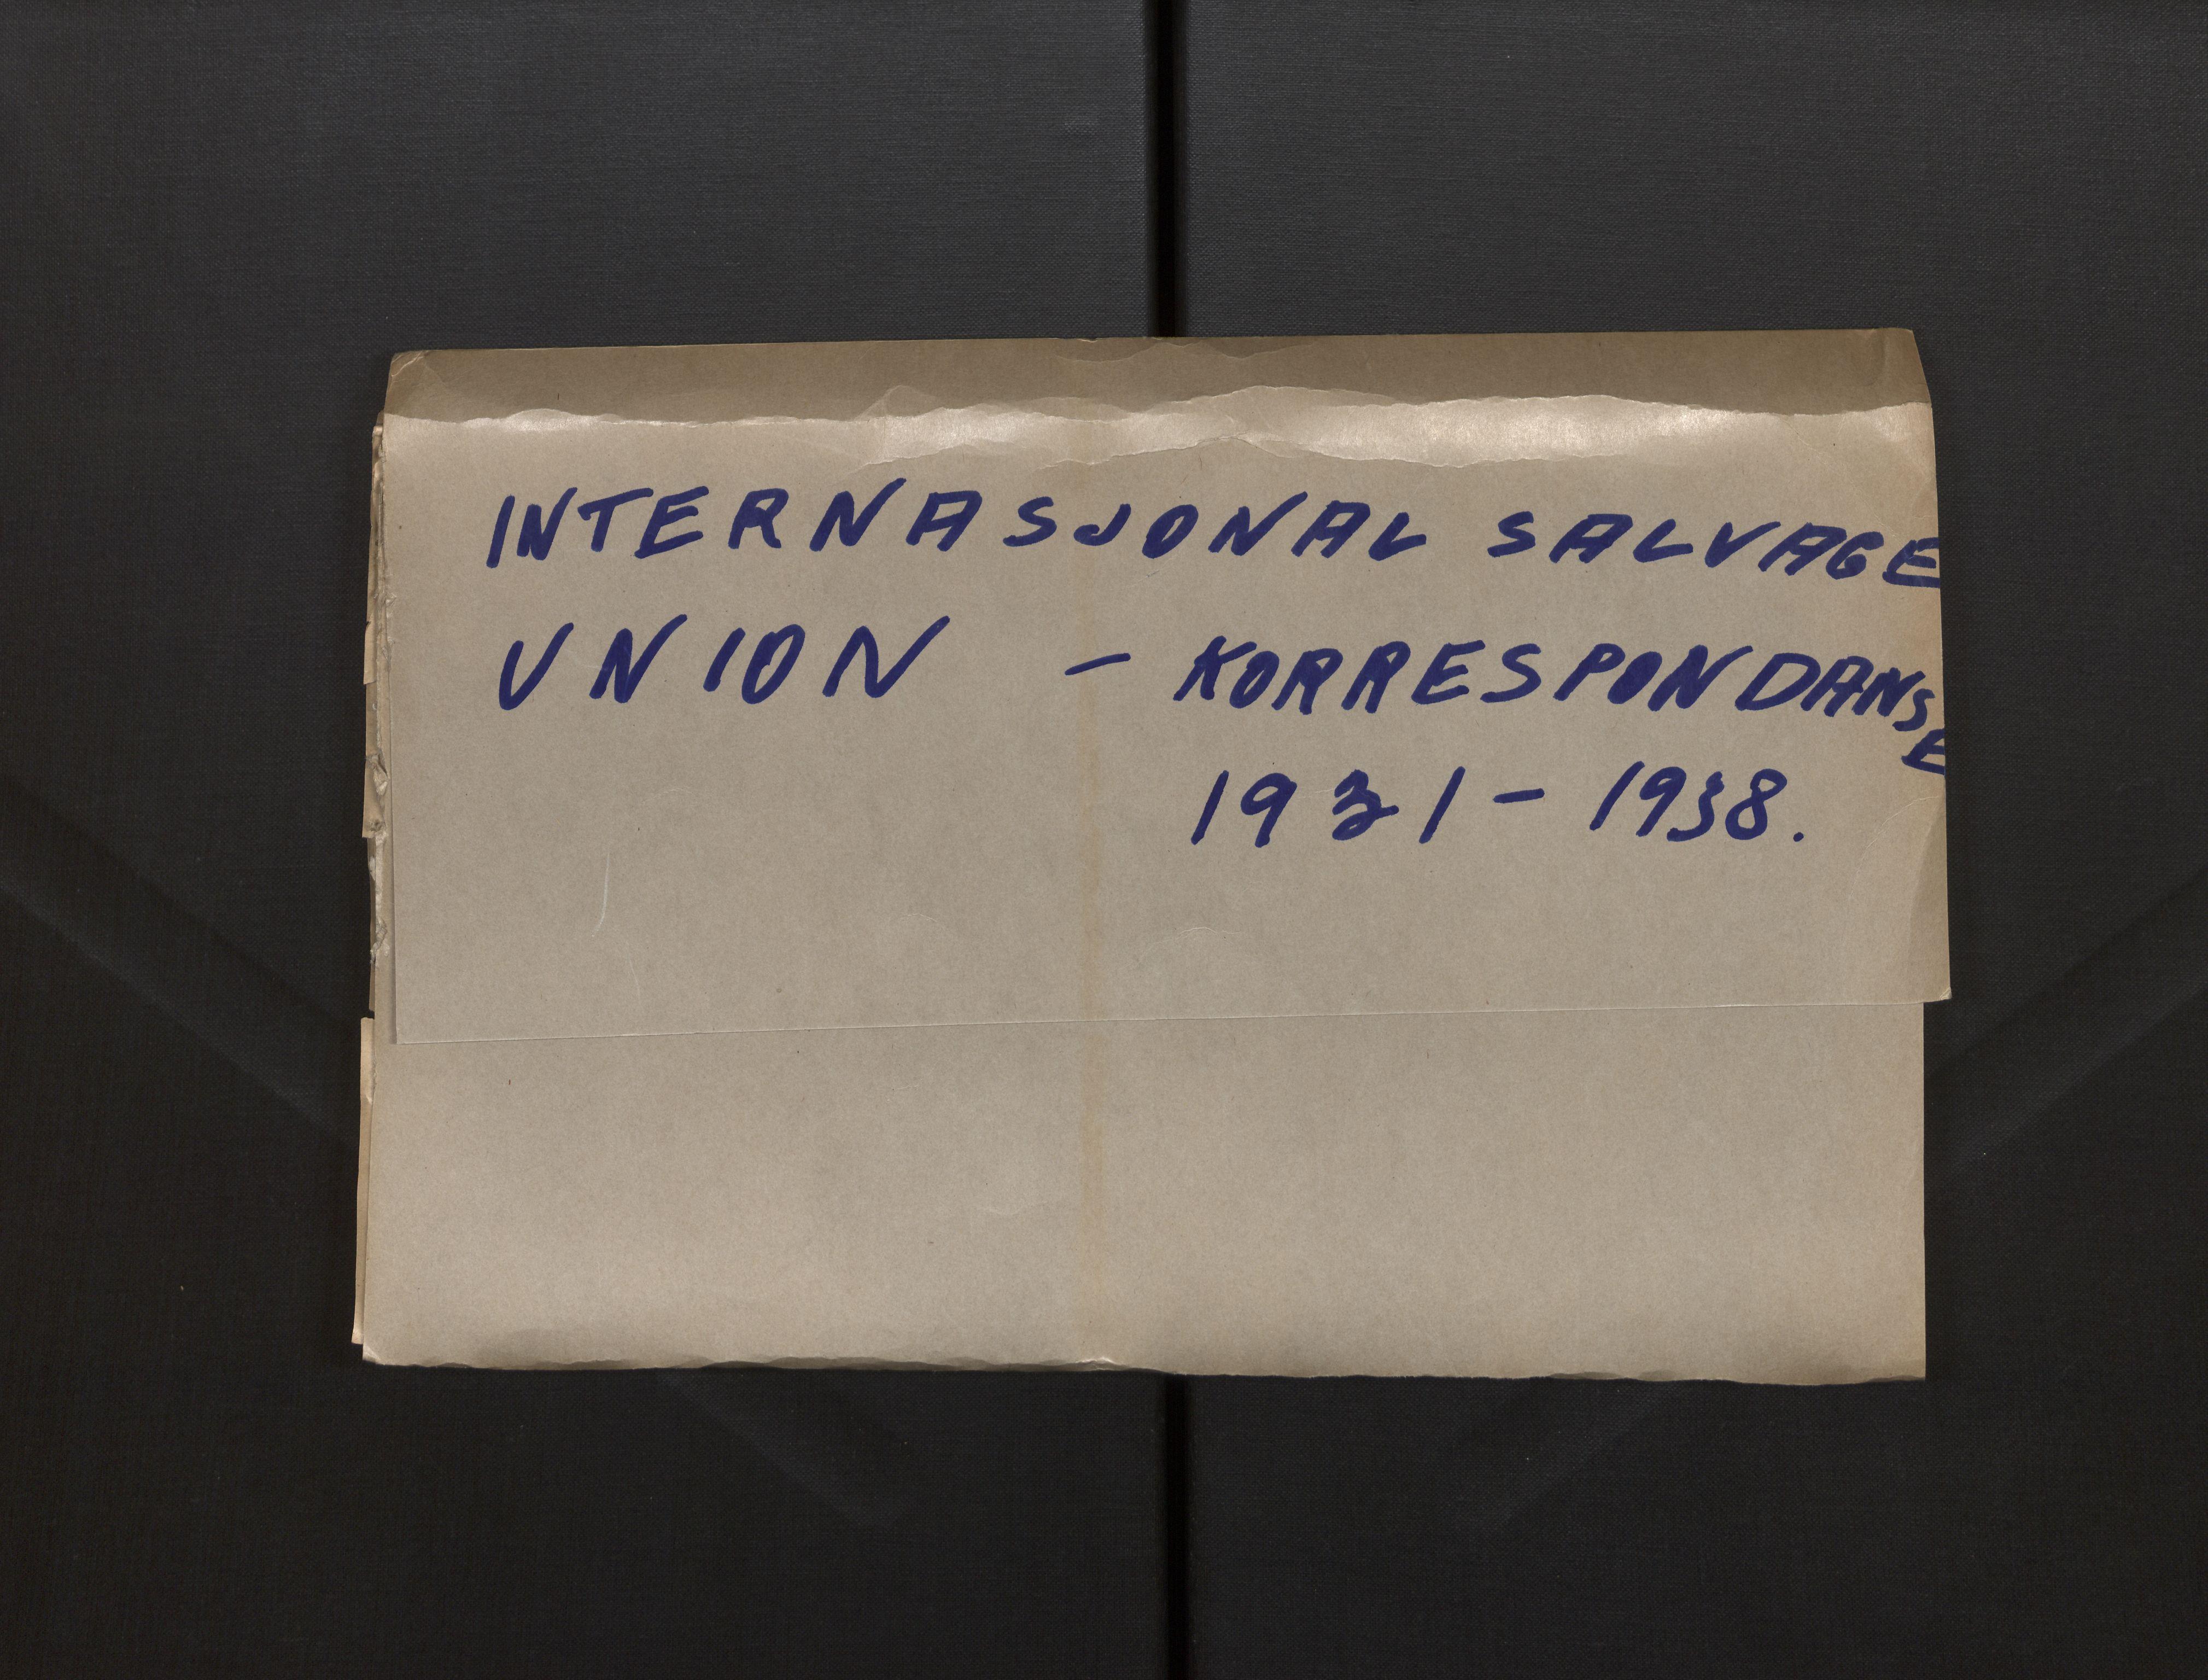 SAB, Norsk Bjergningskompani, 7/L0022: International Salvage Union, 1931-1964, s. 1